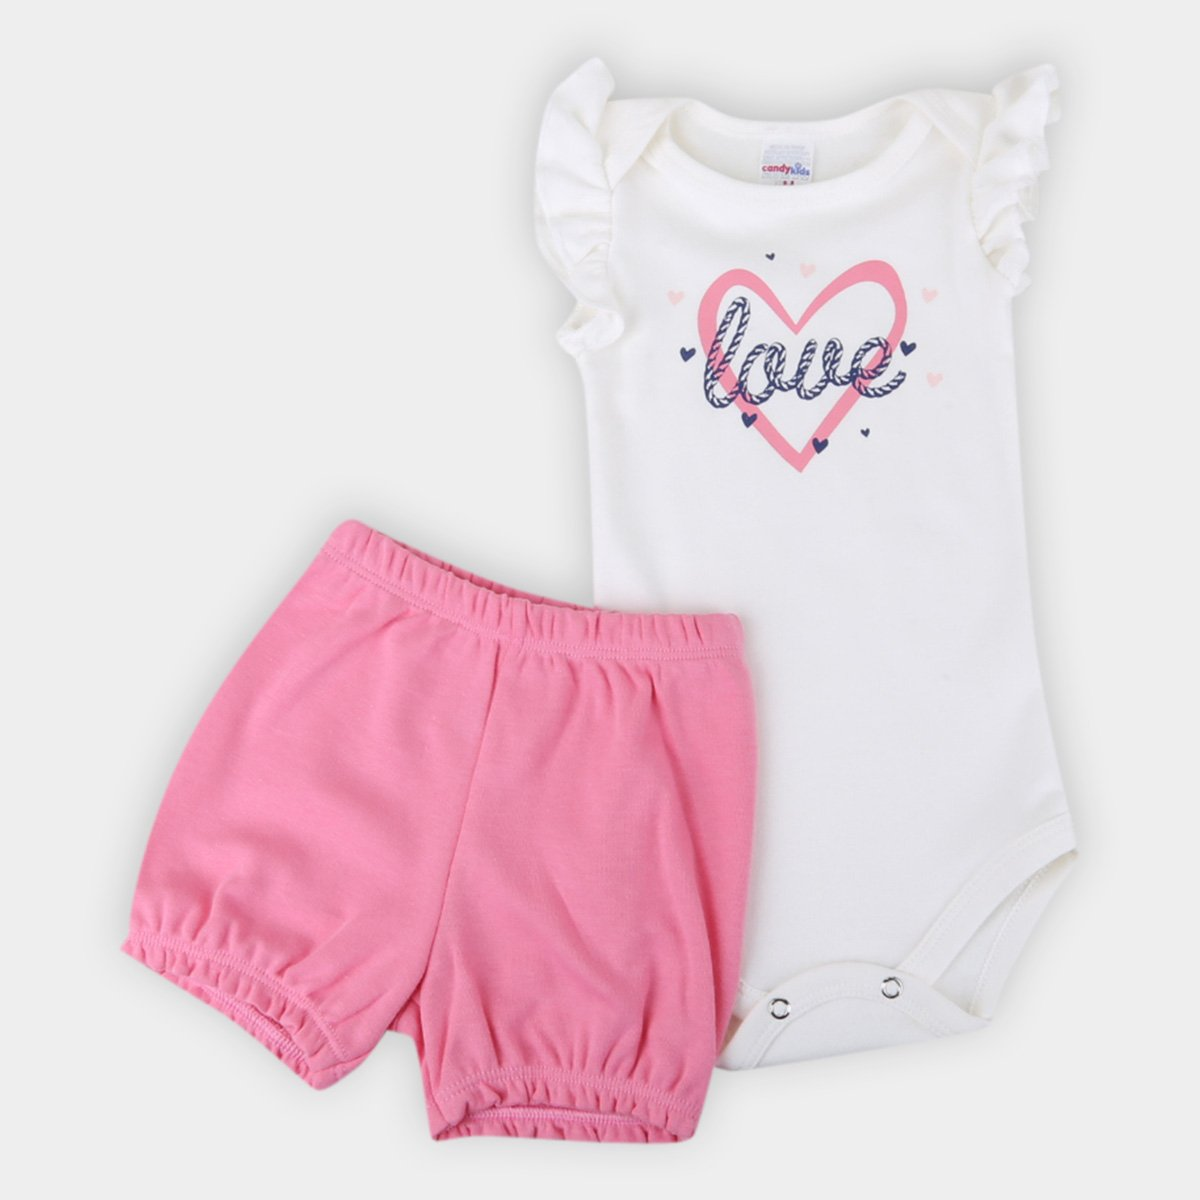 Conjunto Bebê Candy Kids Body E Shorts Suedine Love Feminino